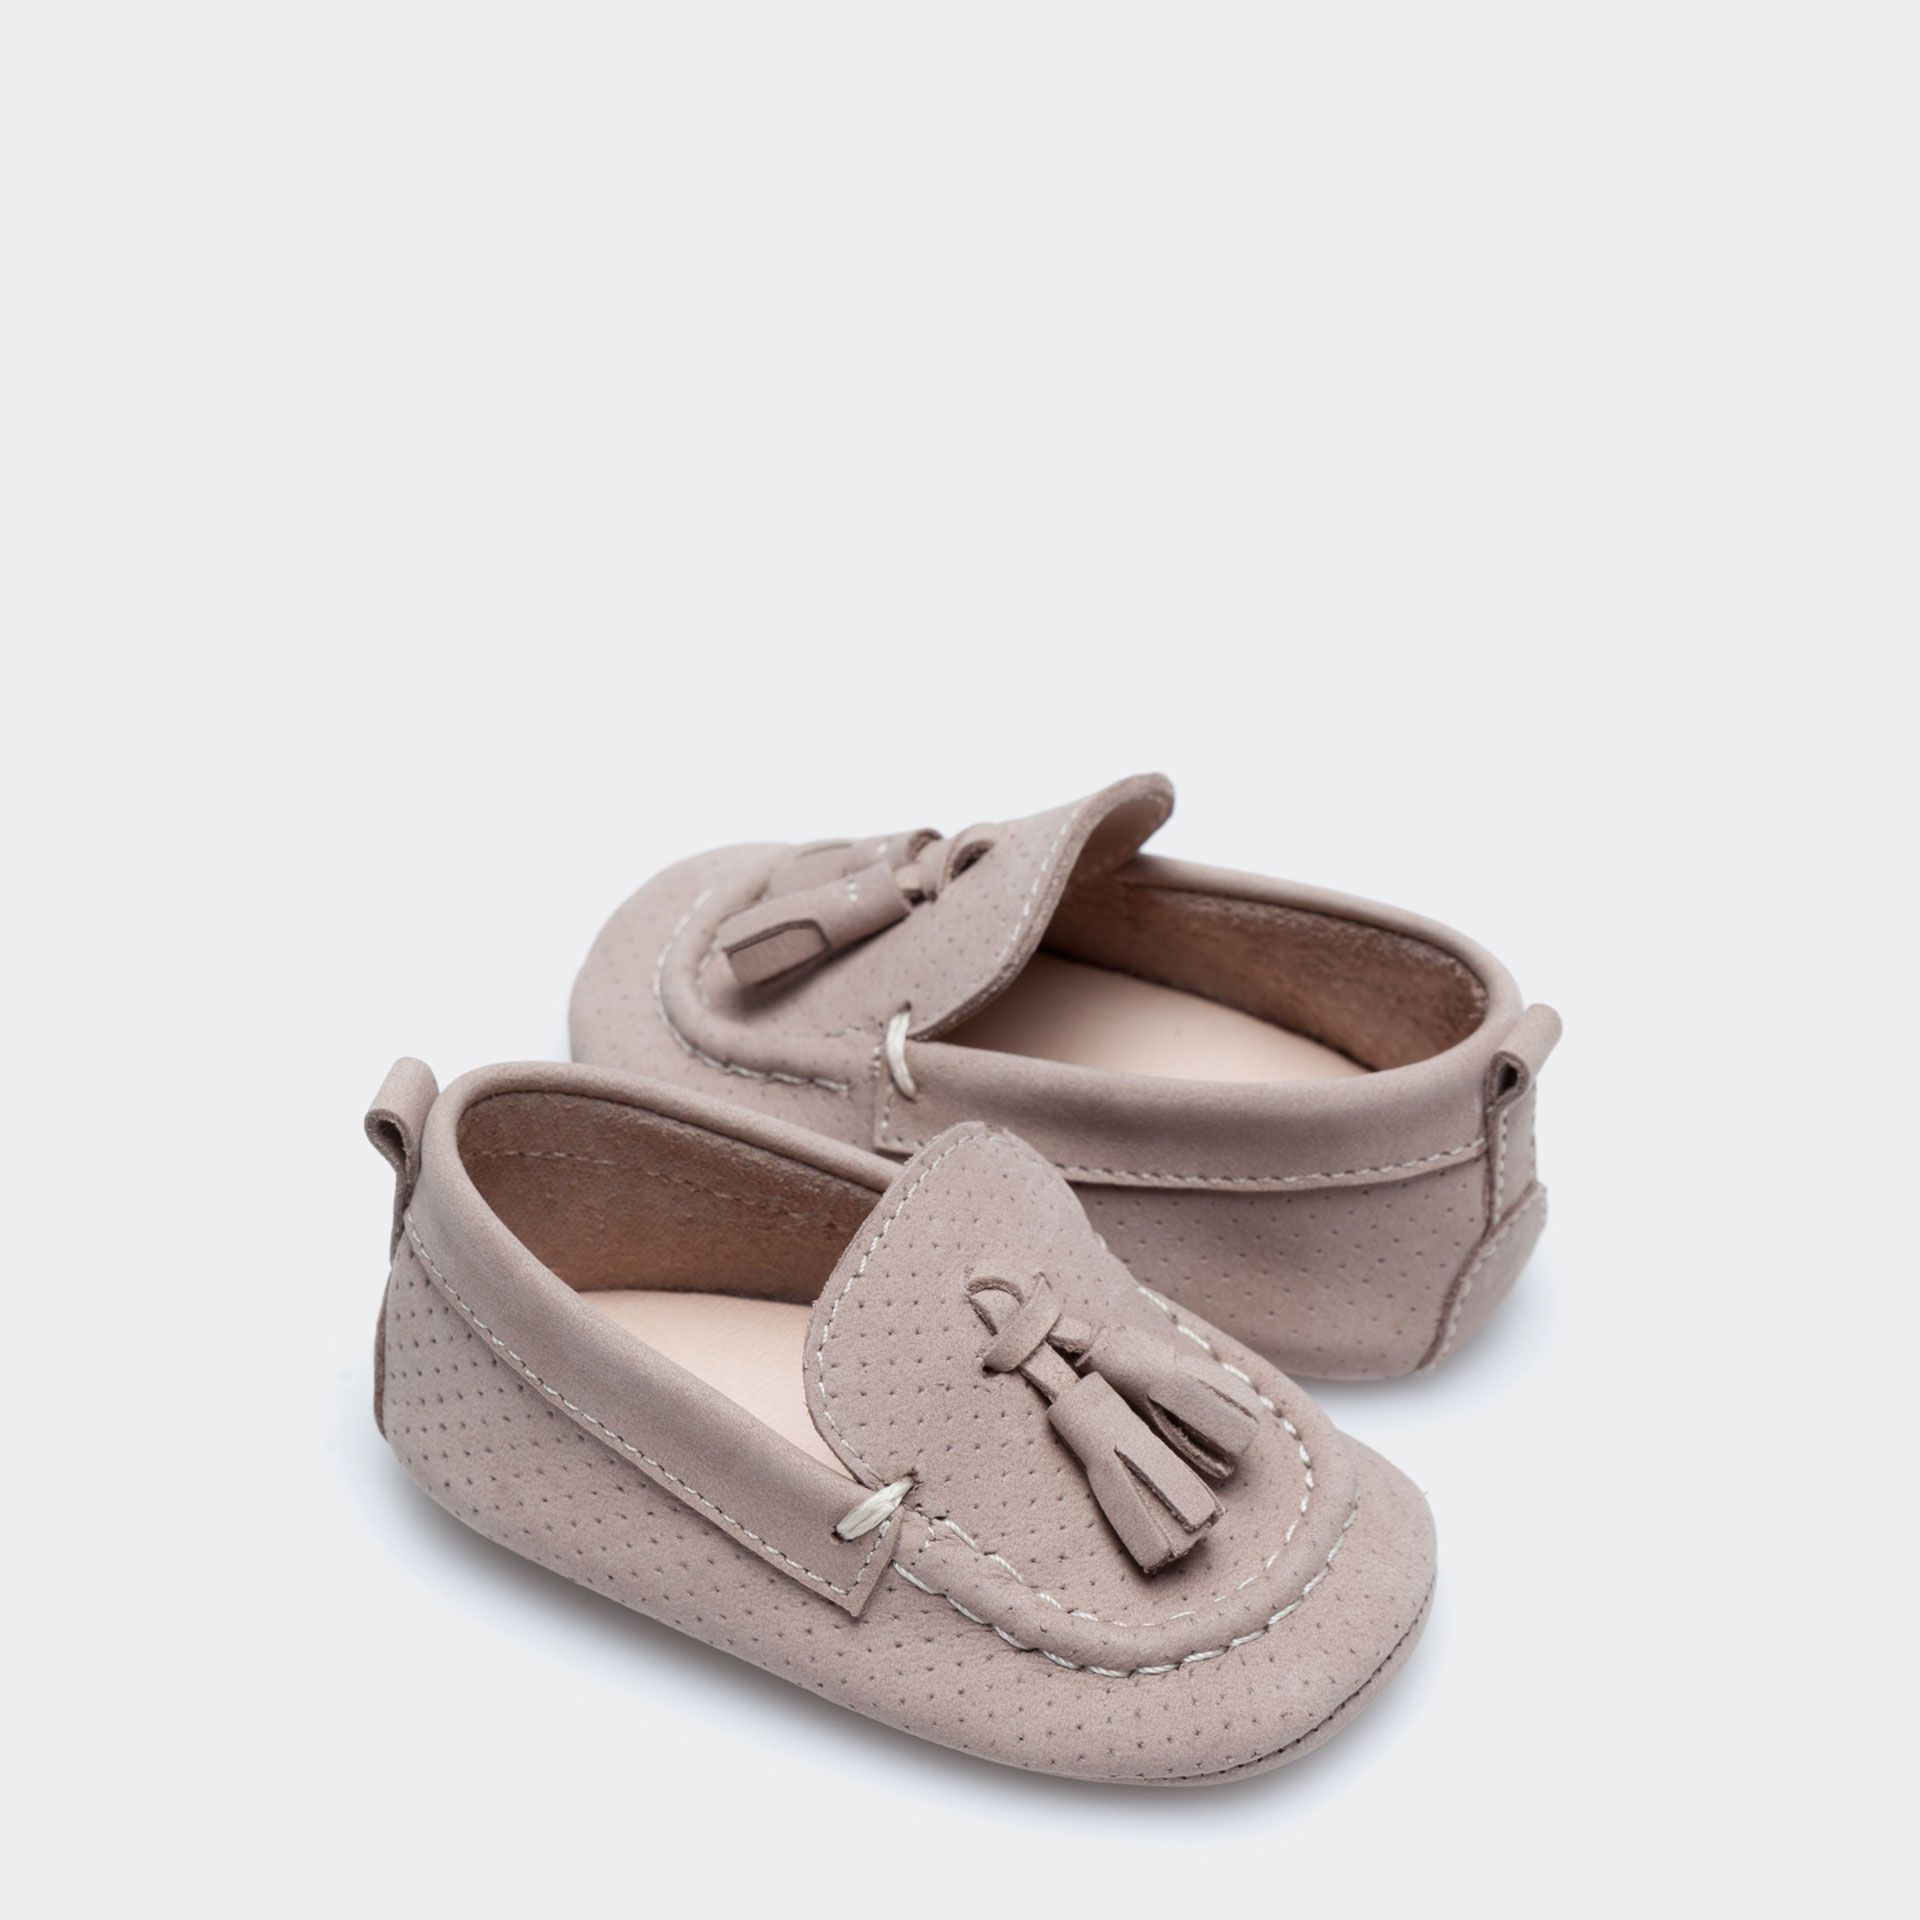 Homewear Zara Shoes amp; Boy Home Baby {mood Holland Mocassin qpHBwzvz